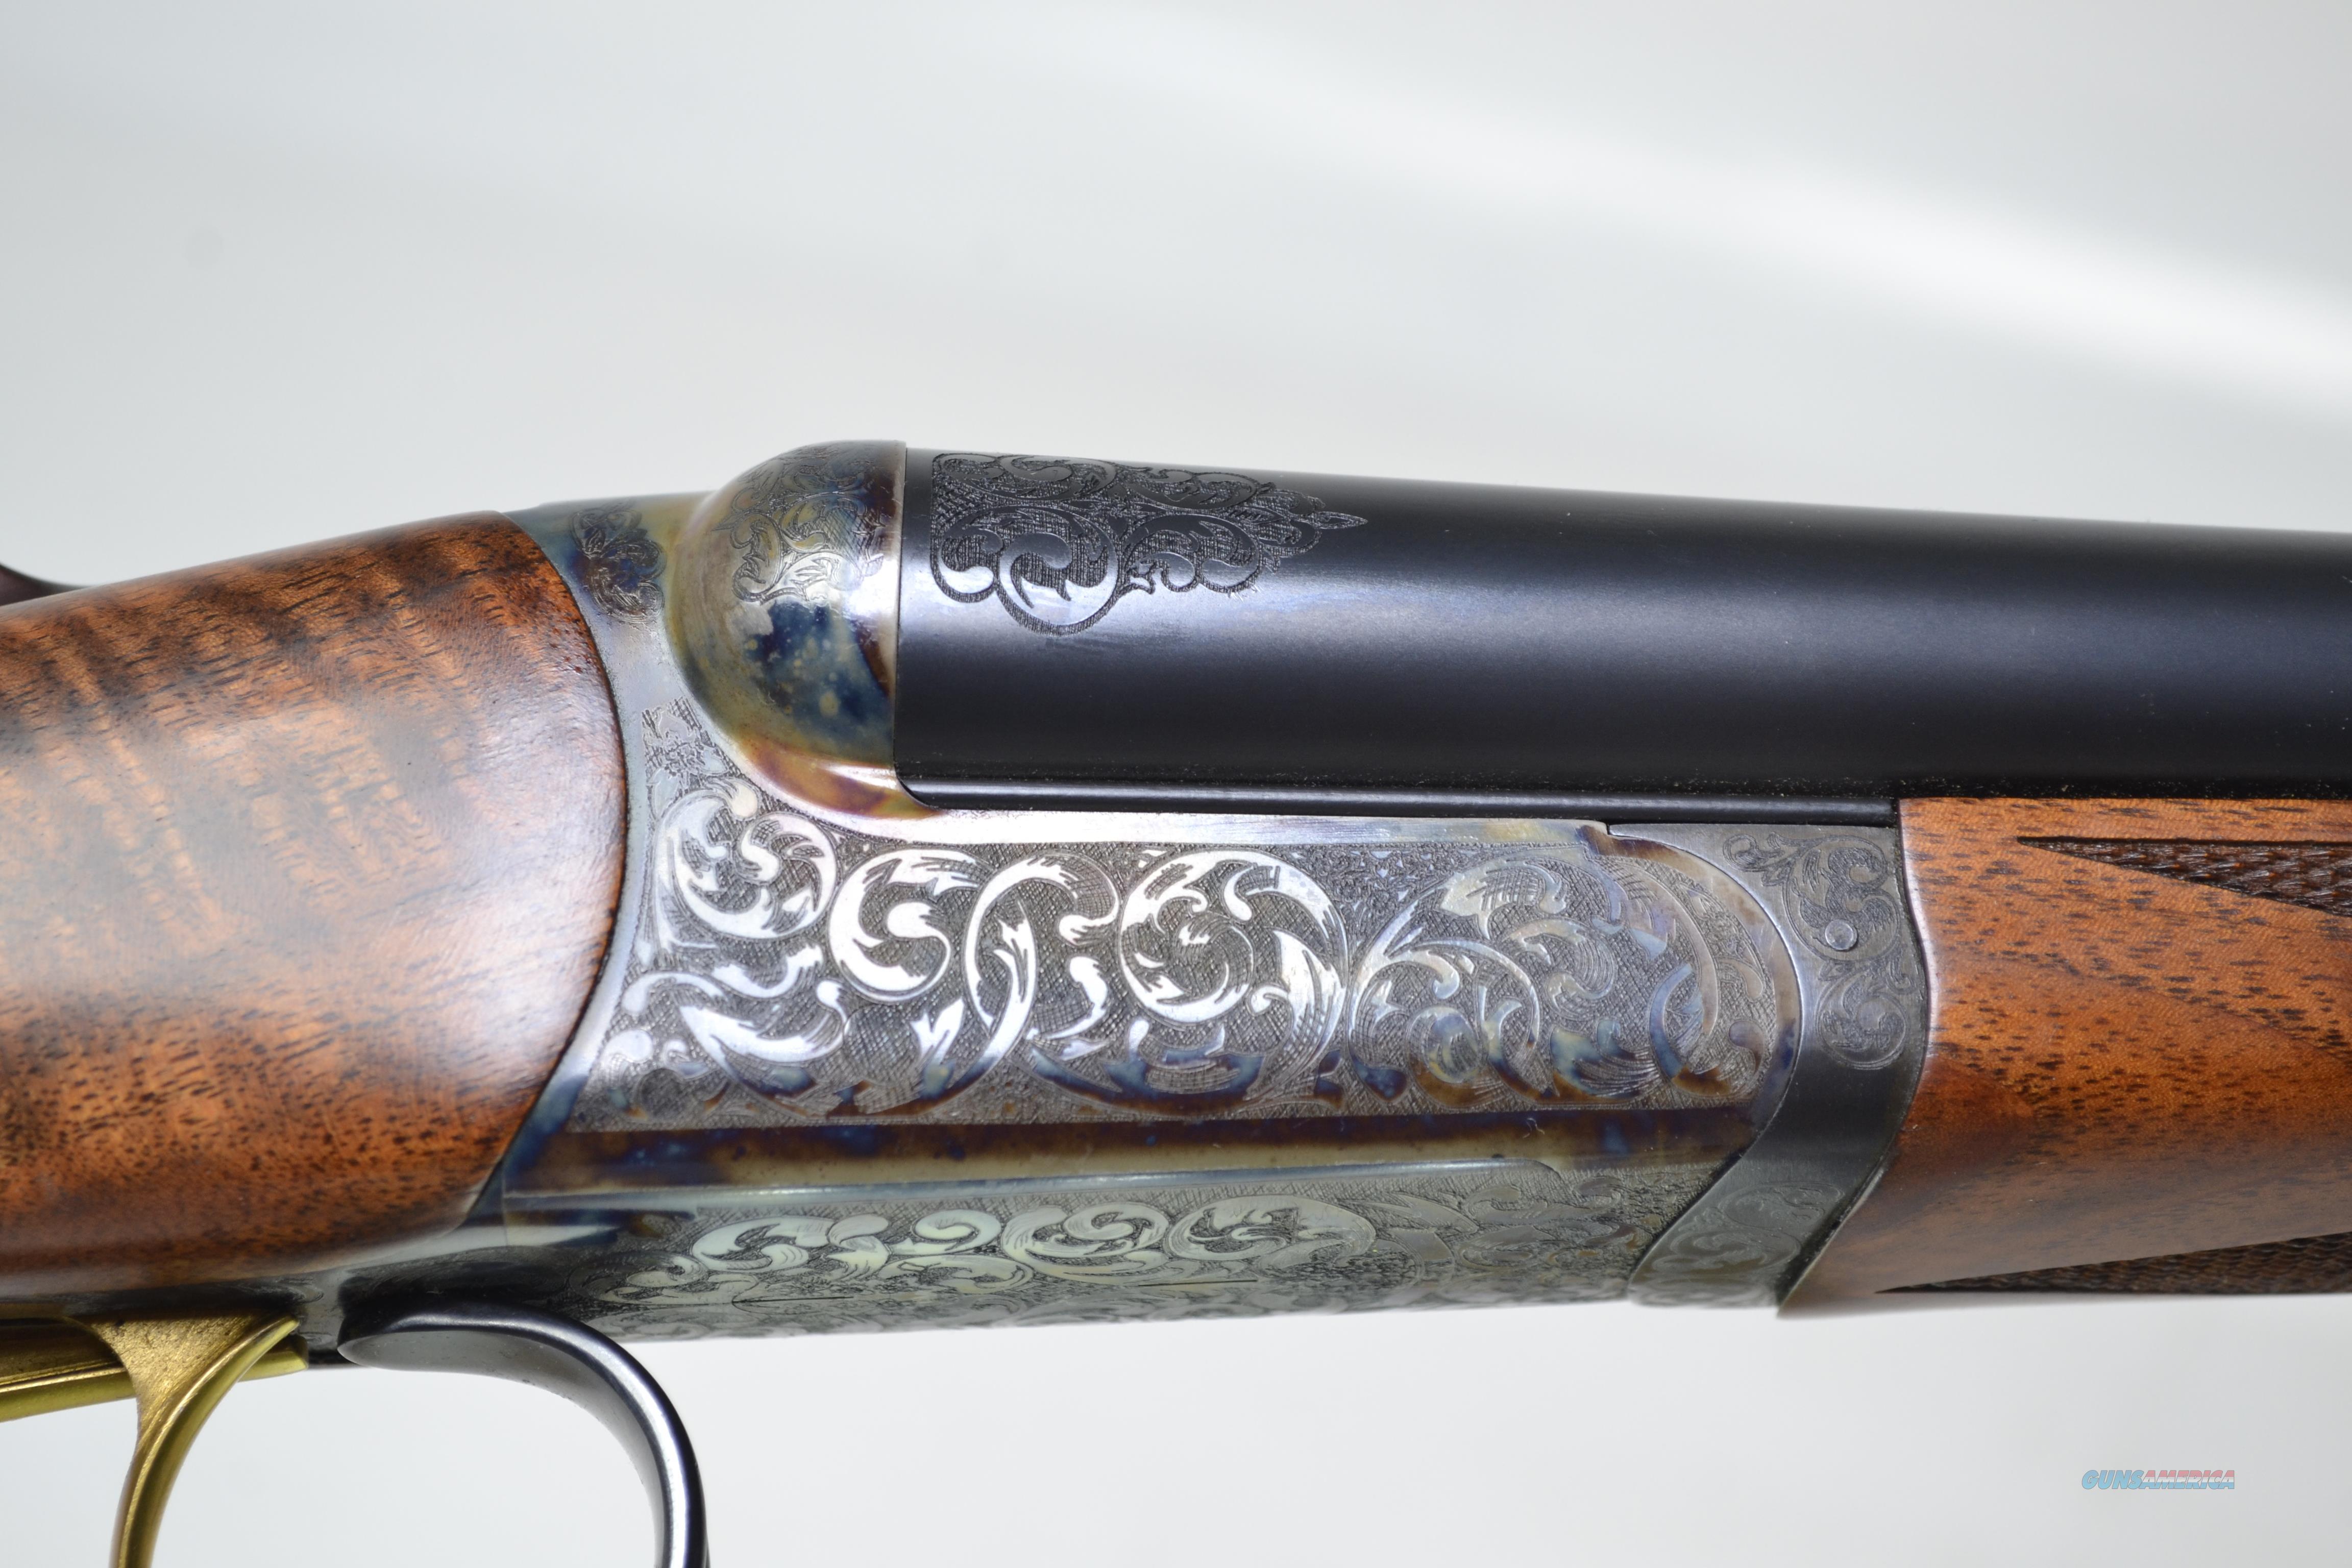 "CSMC - RBL, Rose & Scroll, 20ga. 28"" barrels  Guns > Shotguns > Connecticut (Galazan) Shotguns"